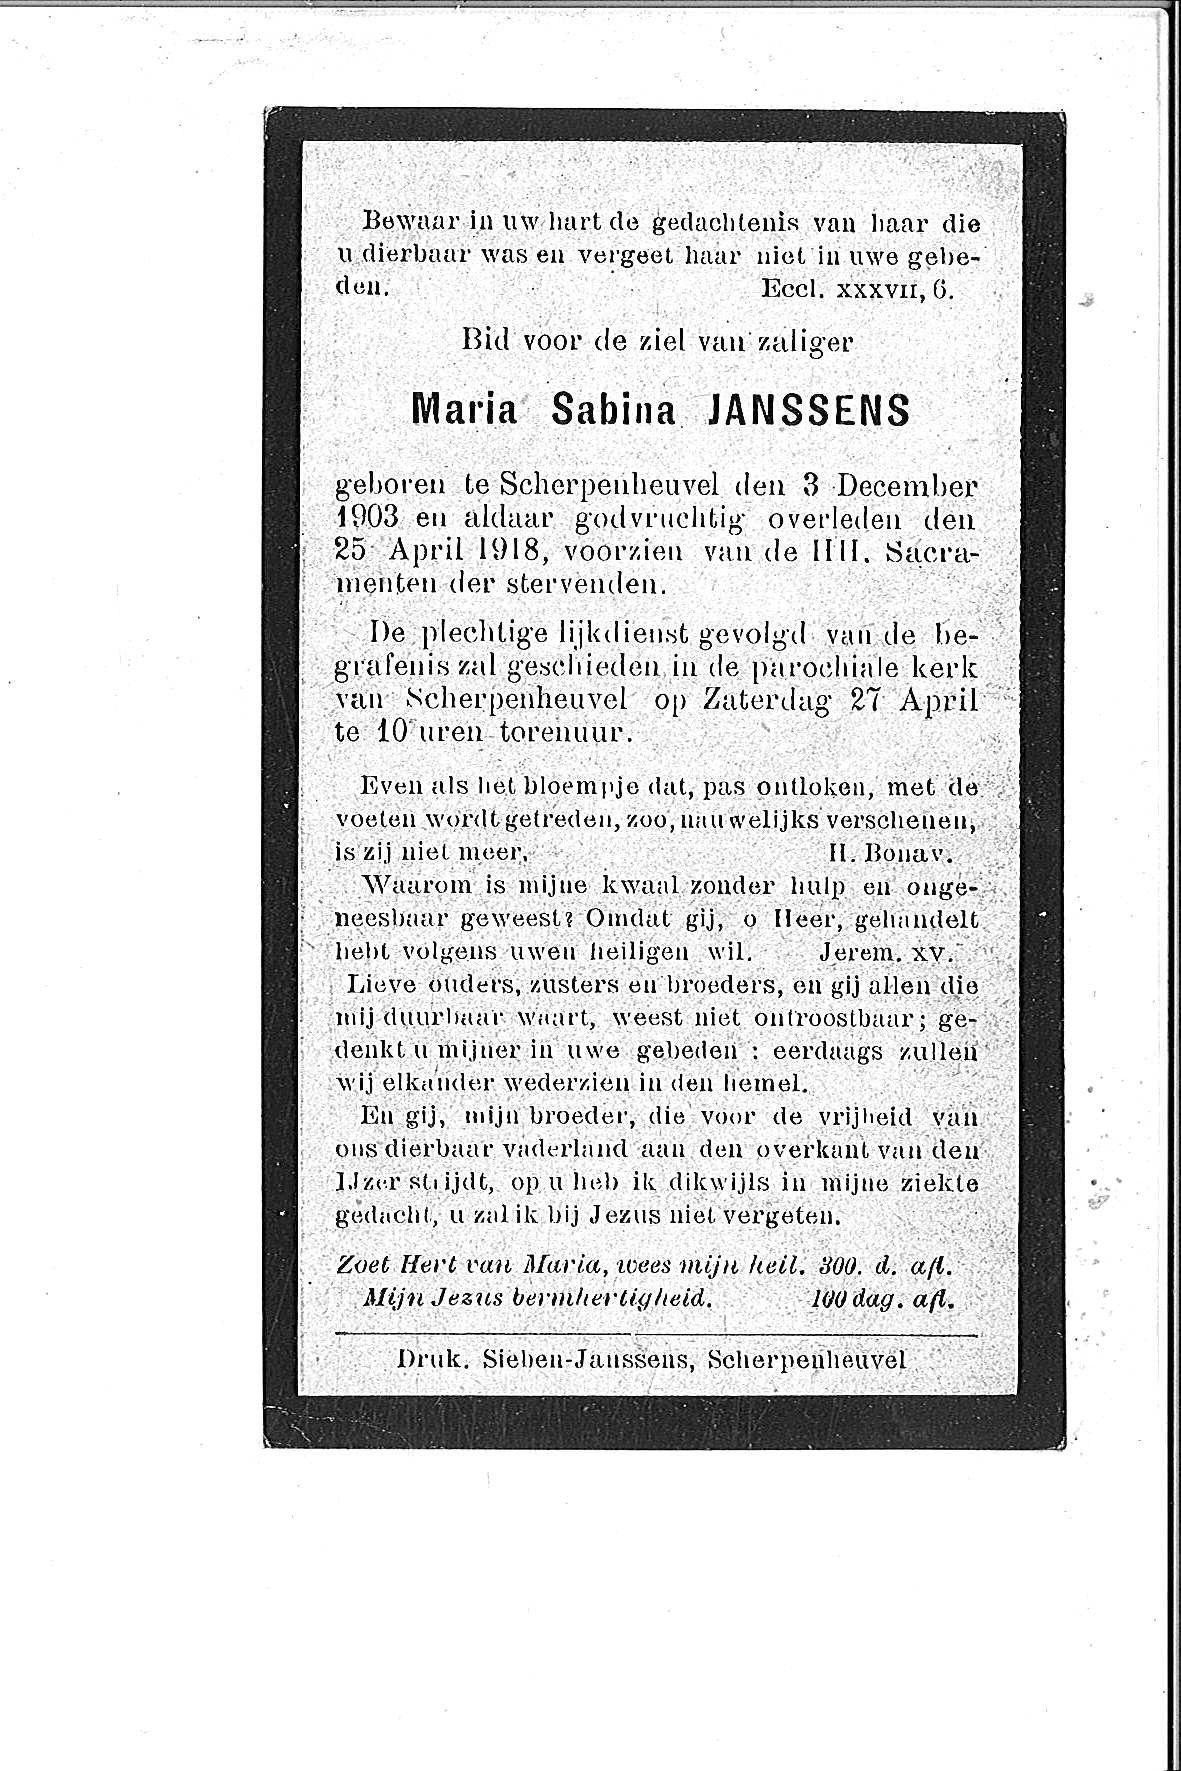 Maria-Sabina(1918)20150428111135_00044.jpg